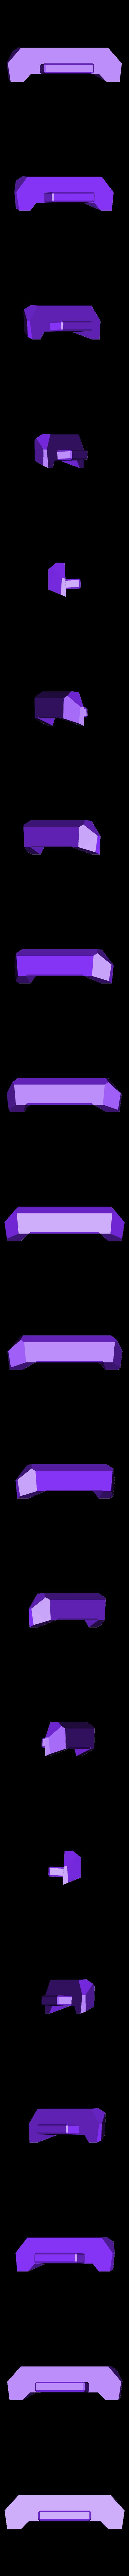 5_Drag_Head5_Neck1Front_GREEN.stl Download STL file ARTICULATED DRAGONLORD (not Dragonzord) - NO SUPPORT • 3D printer model, Toymakr3D